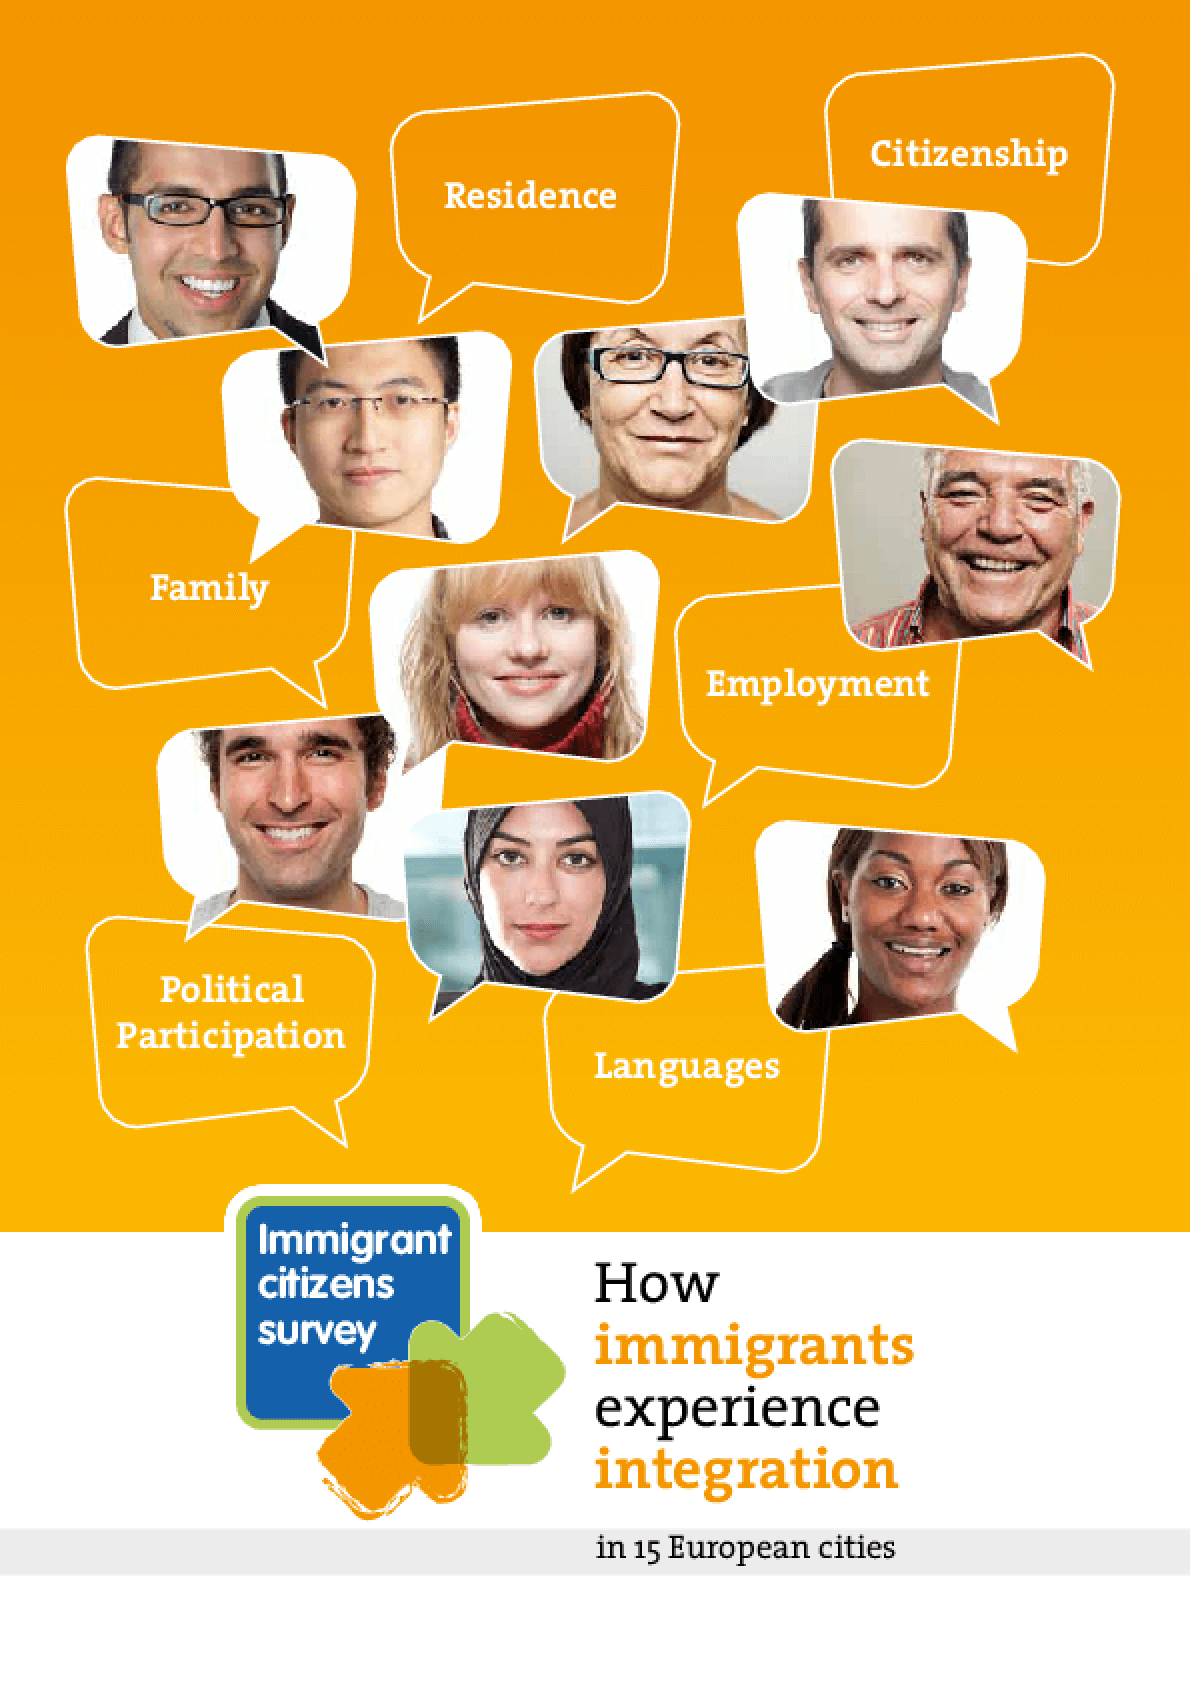 Immigrant Citizens Survey